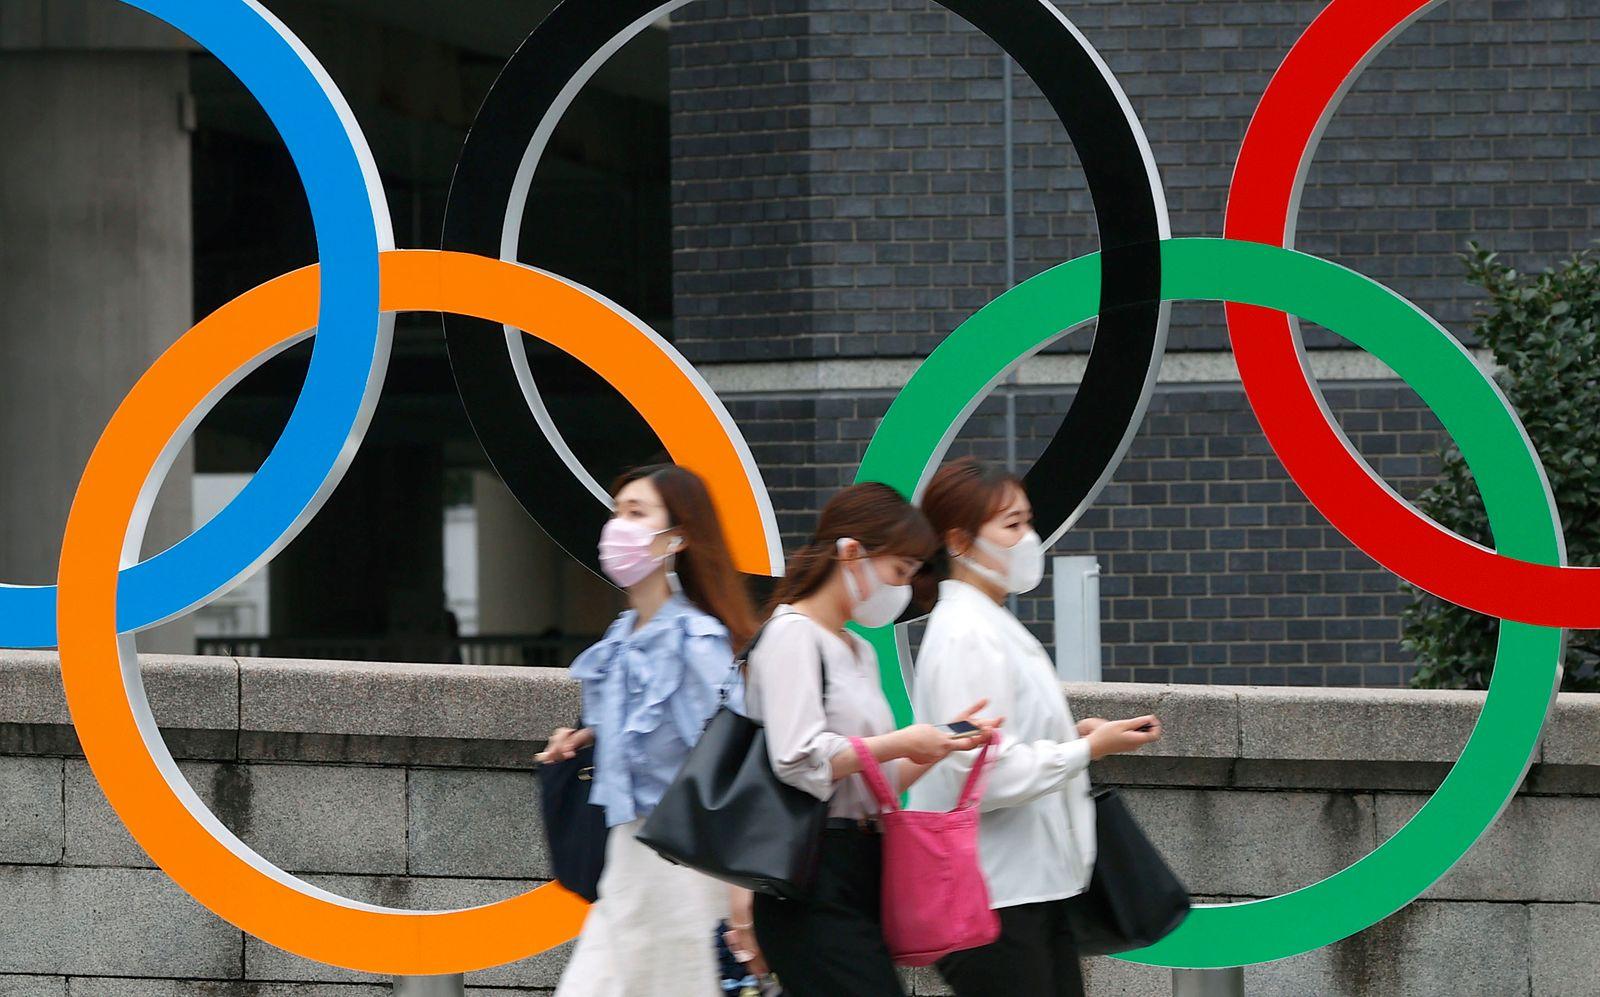 Coronavirus - Olympia-Stadt Tokio vor erneutem Notstand